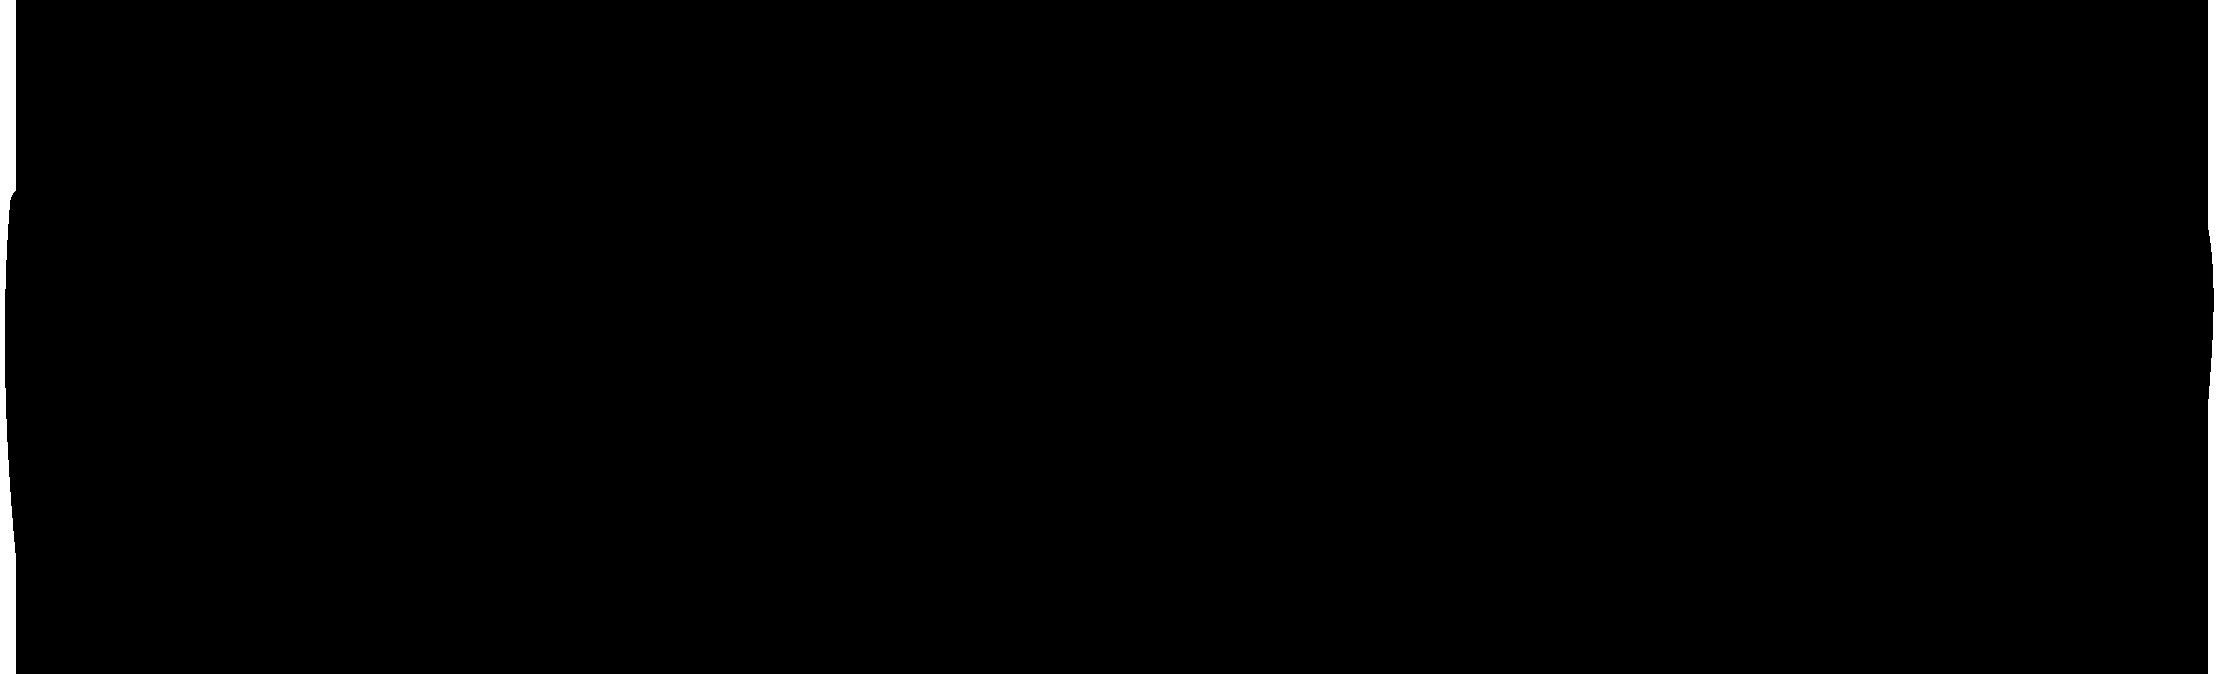 IAMSU Logo_2_black.png